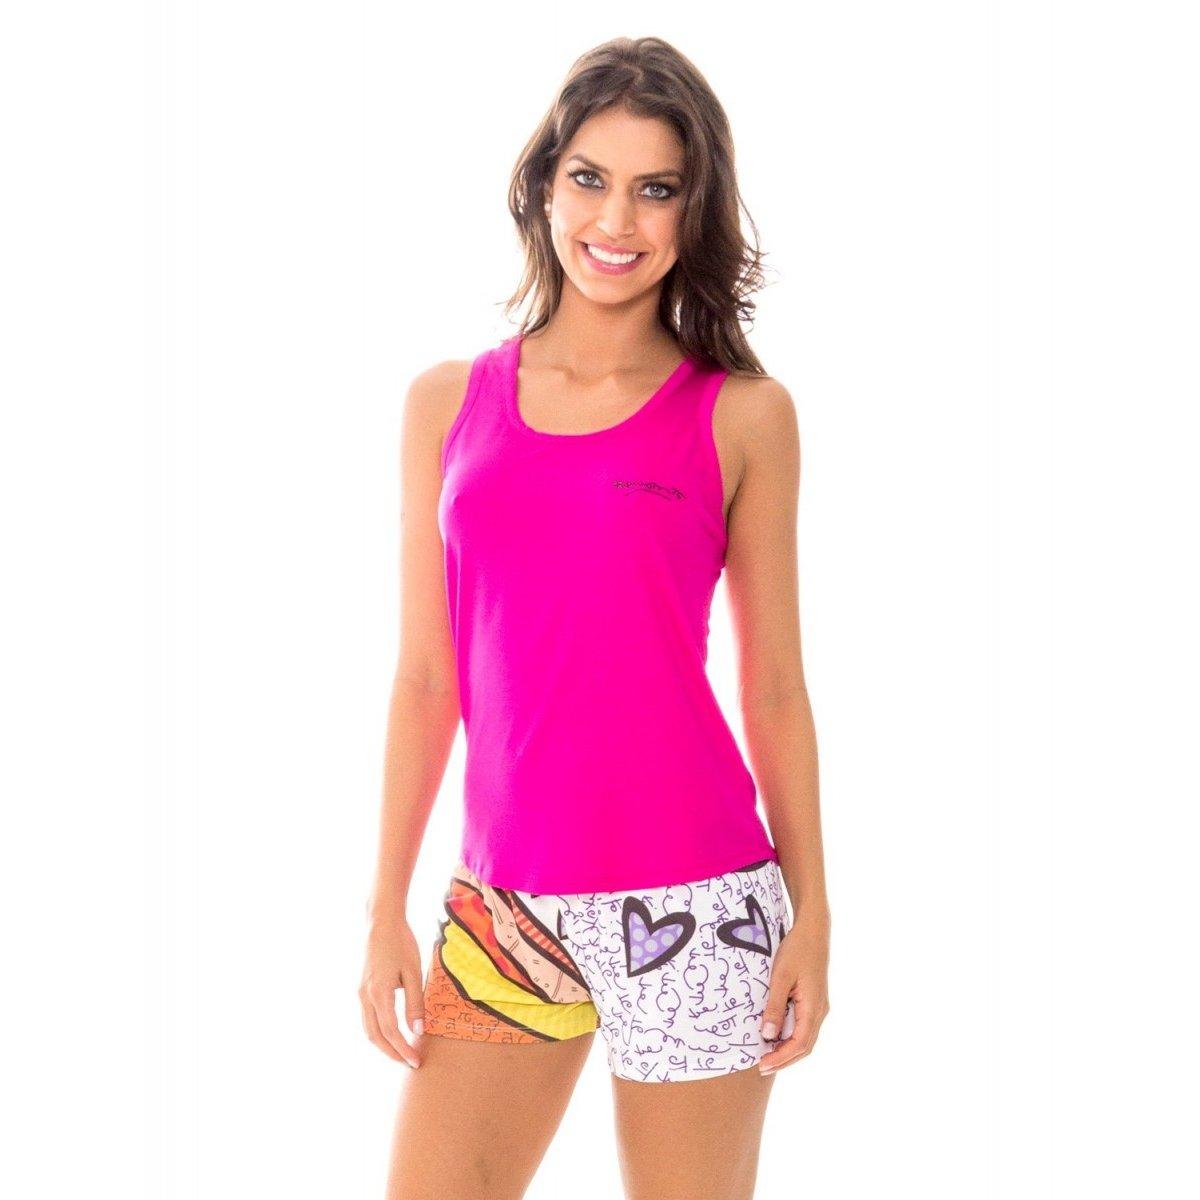 735d36f110b307 Pijama Feminino Recco Baunilha Viscose Curto 09586 - Rosa